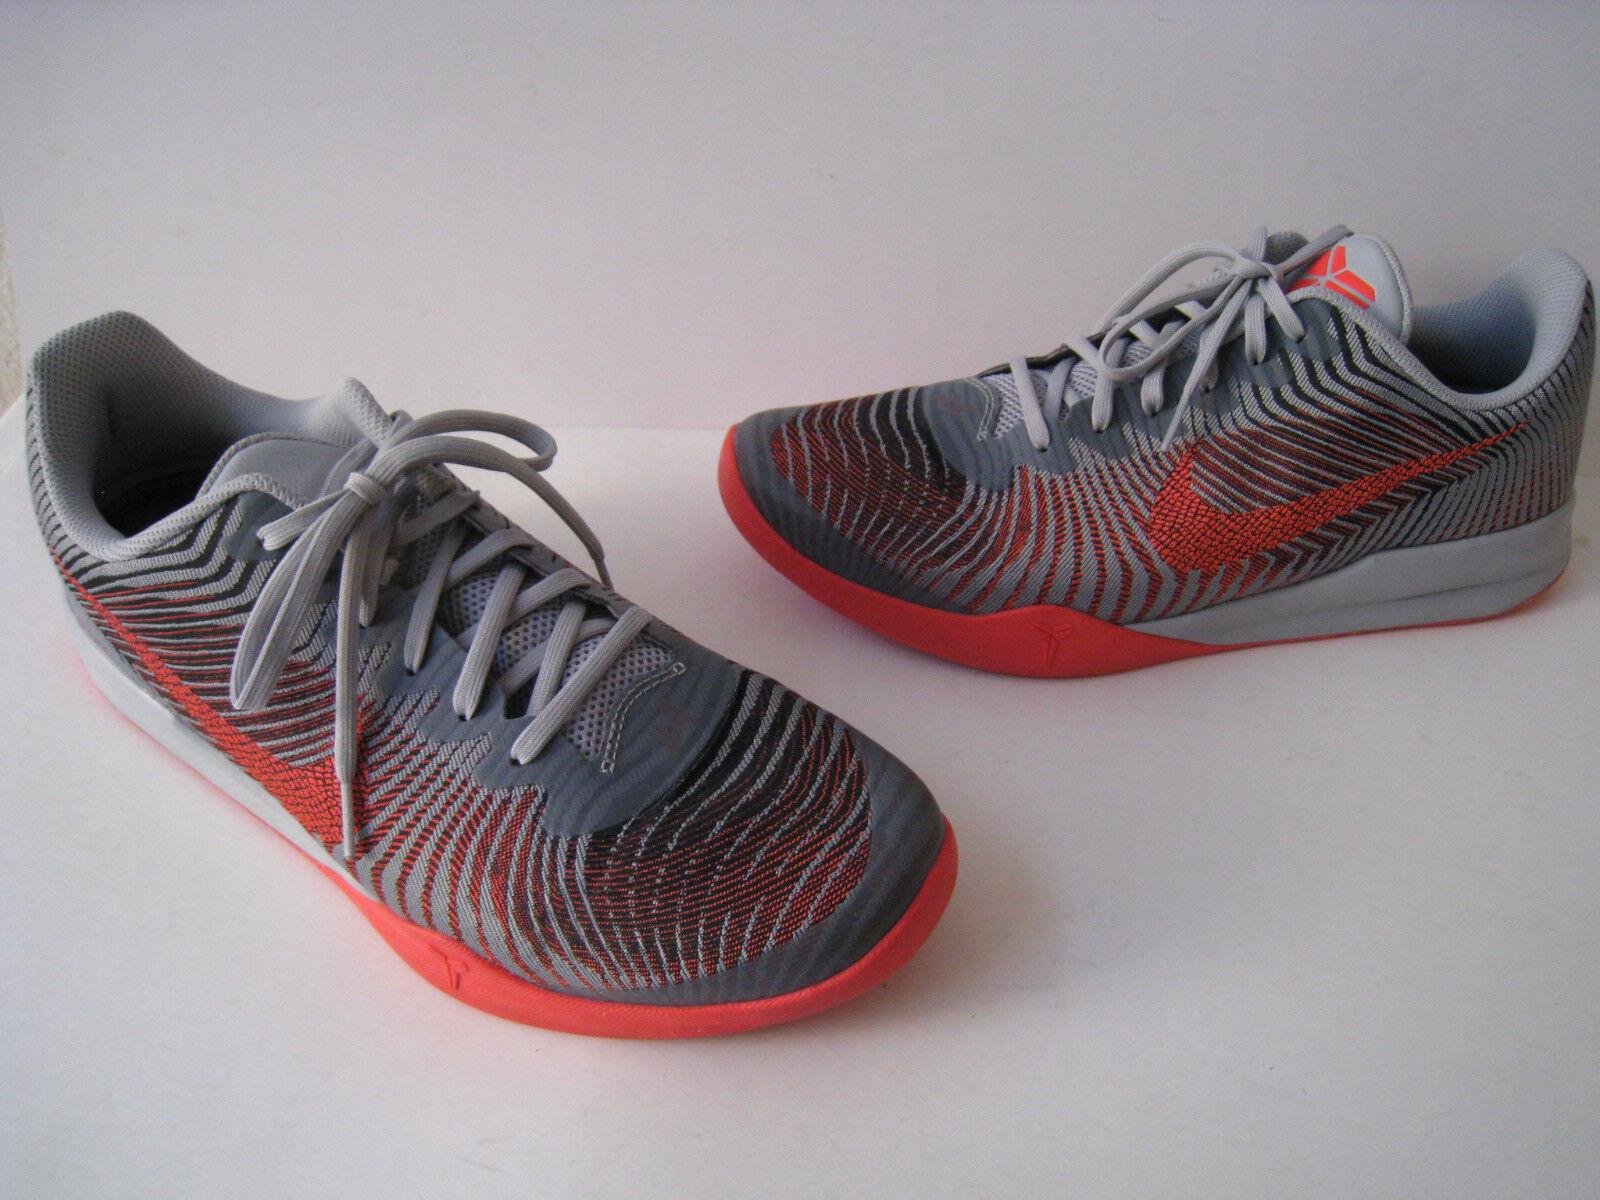 Nike kobe basket Uomotalit 2 scarpe da basket kobe uomini dimensioni noi 13 a3938b